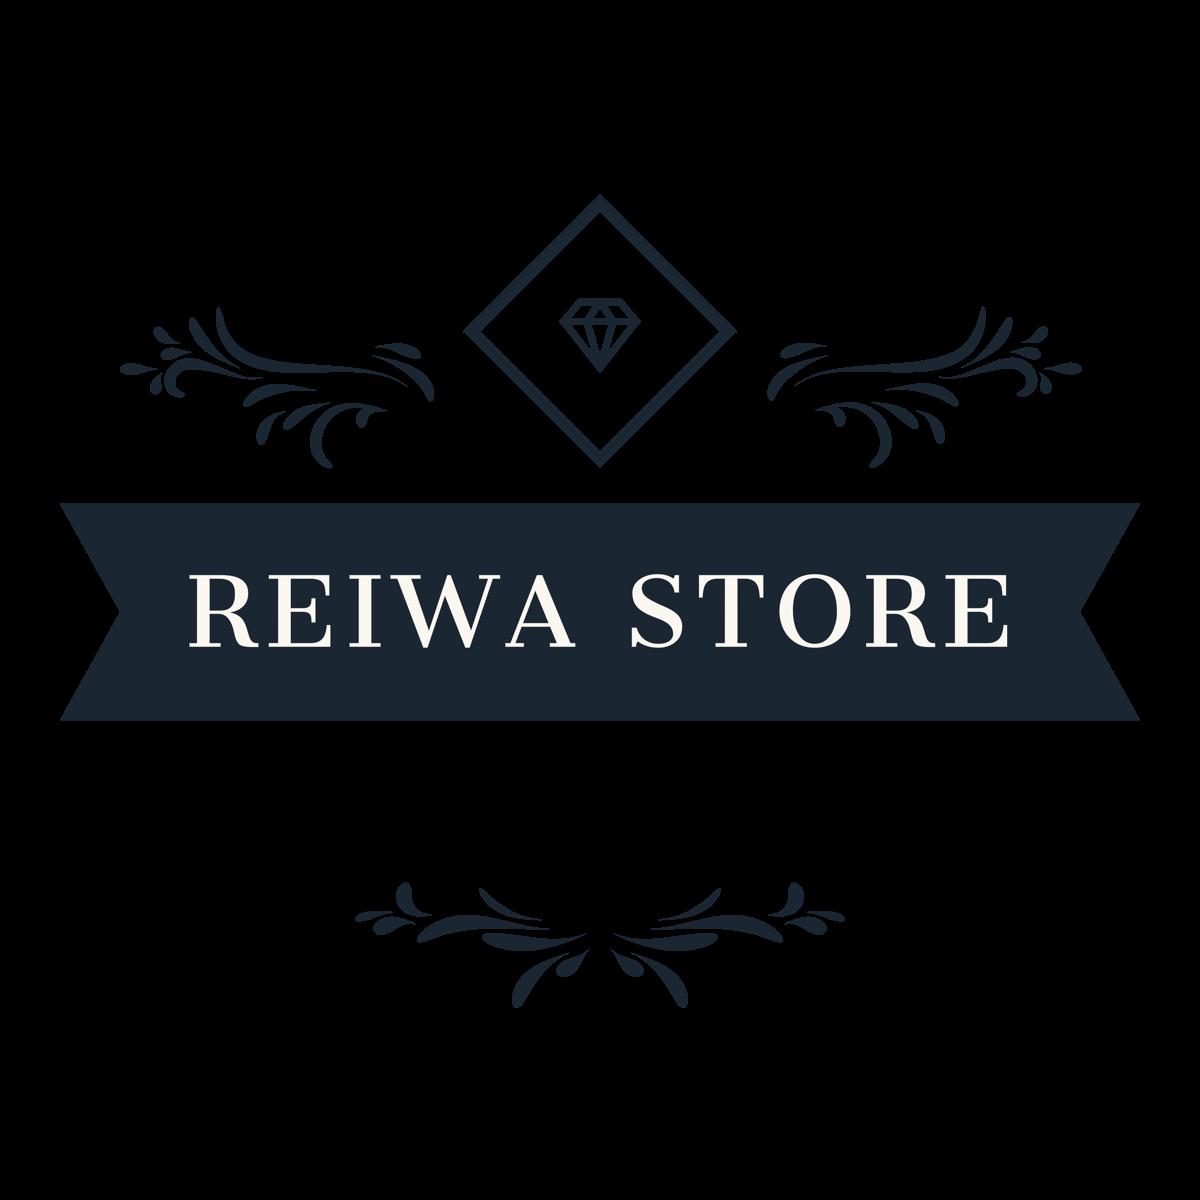 REIWA STORE